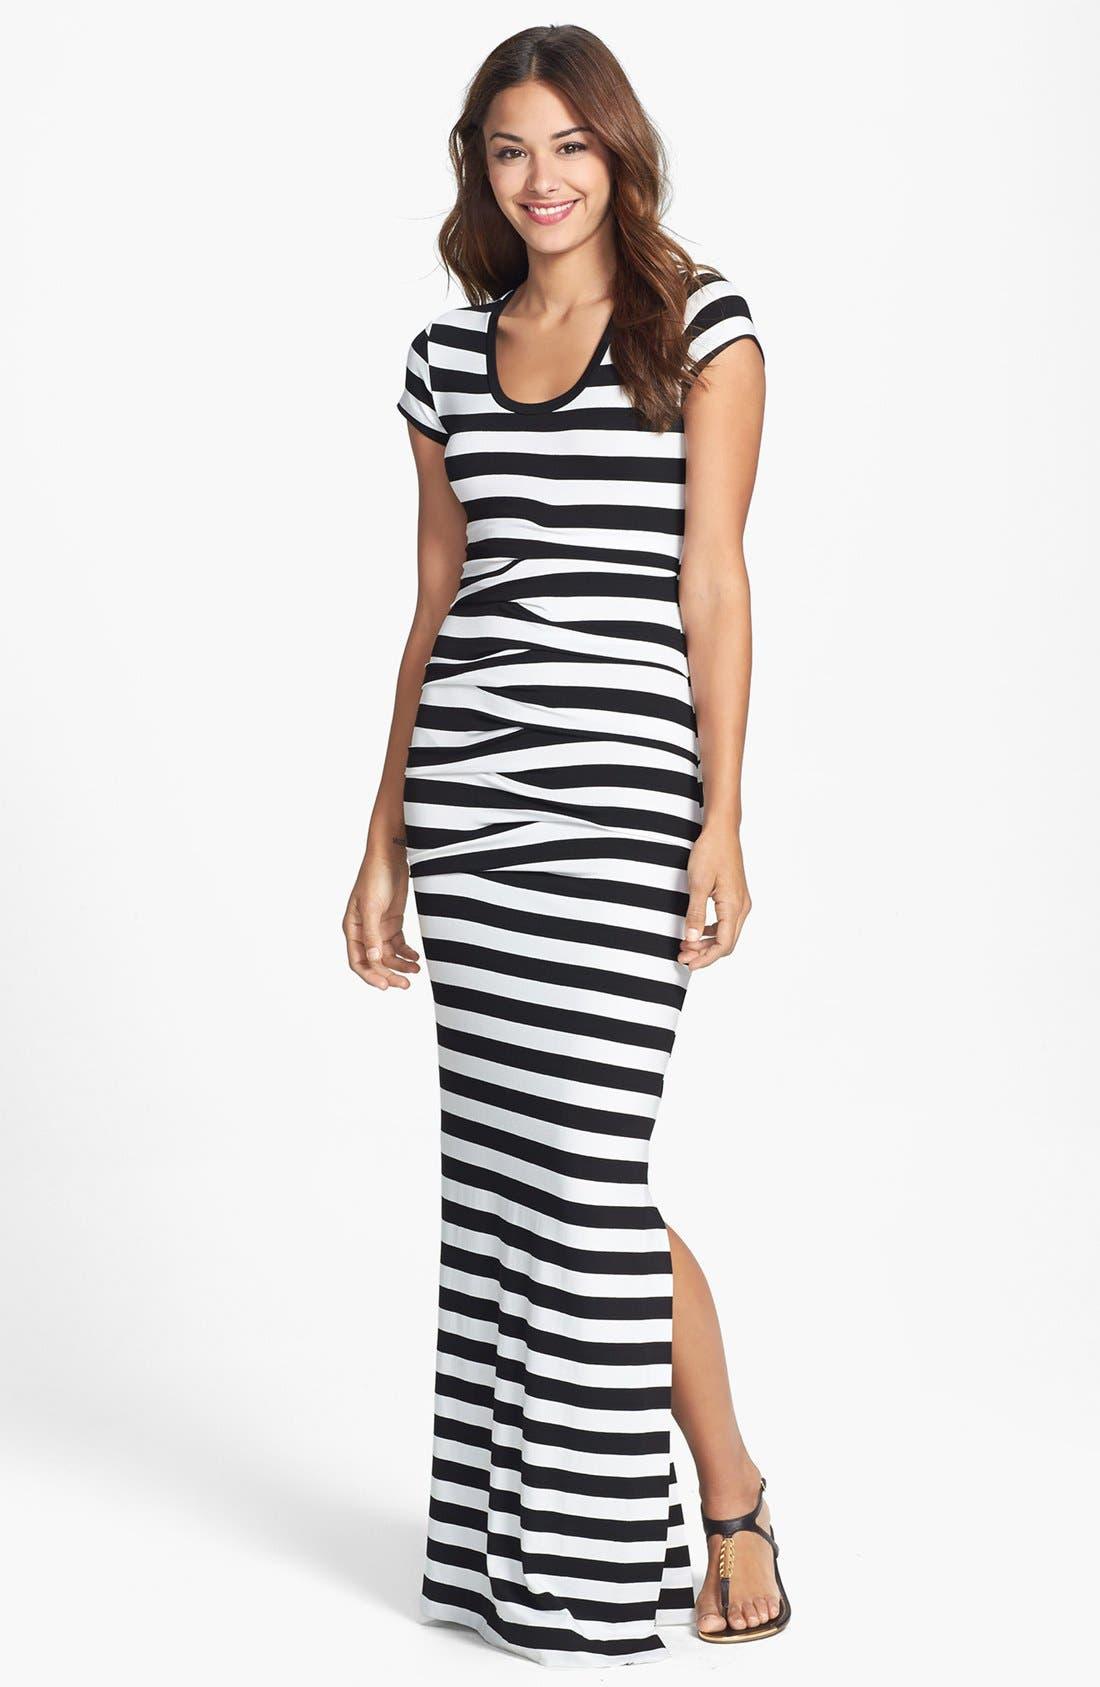 Main Image - Nicole Miller 'Vanessa' Stripe Tidal Pleat Jersey Maxi Dress